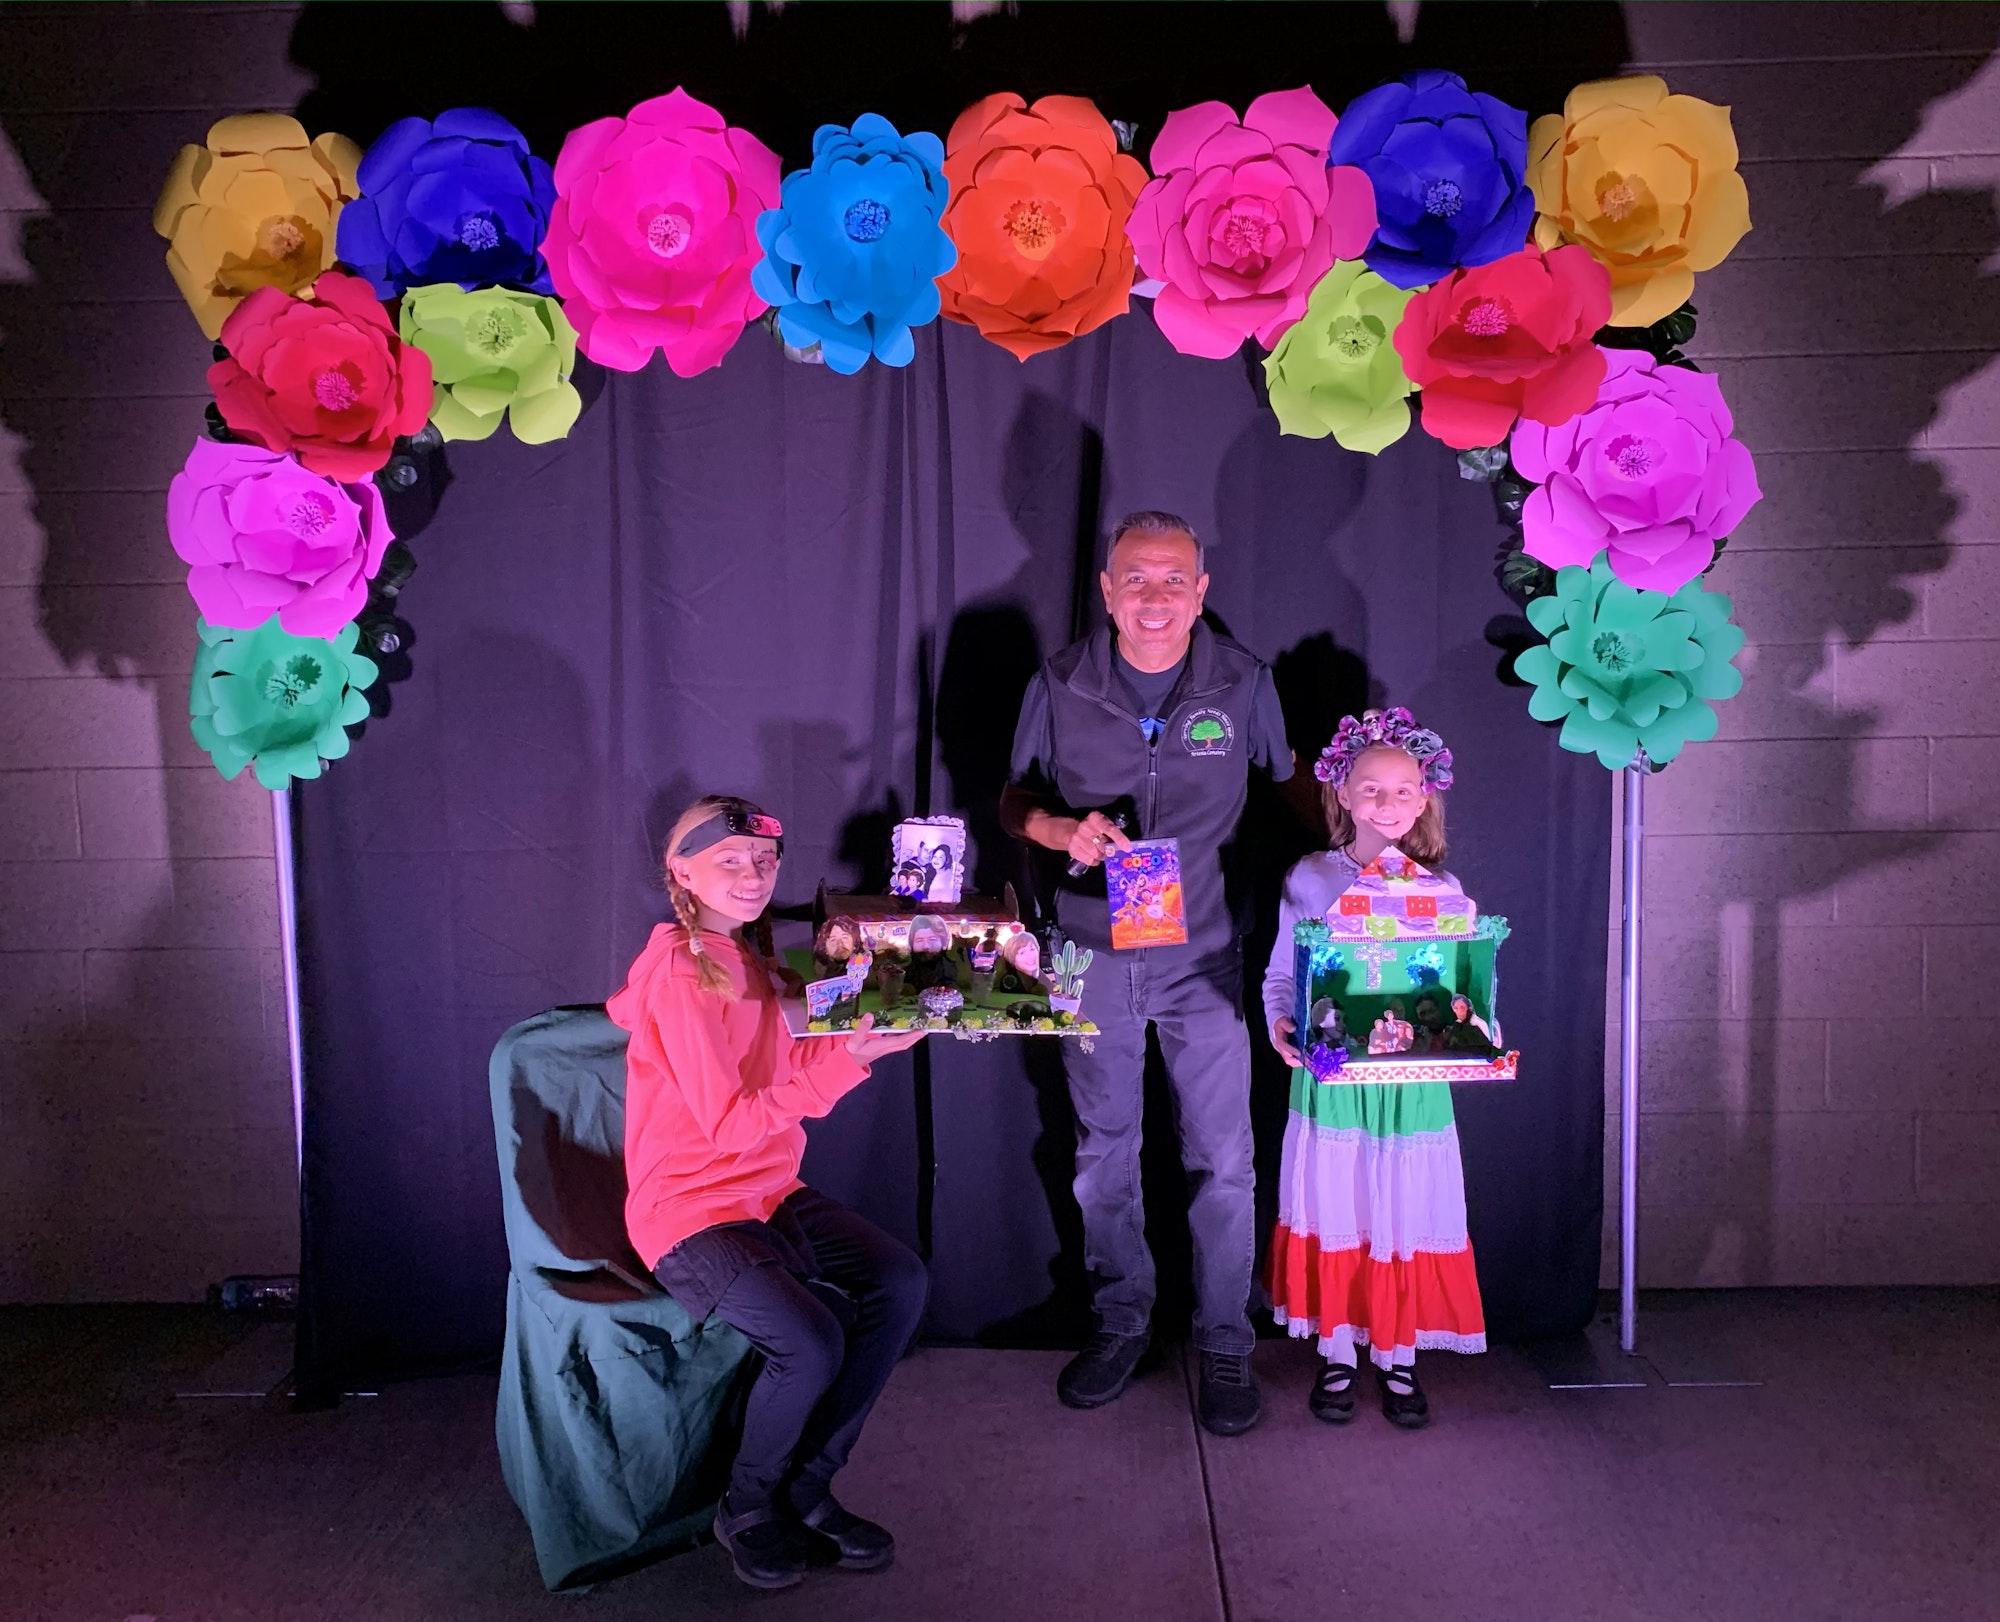 awards presented children of contest winner